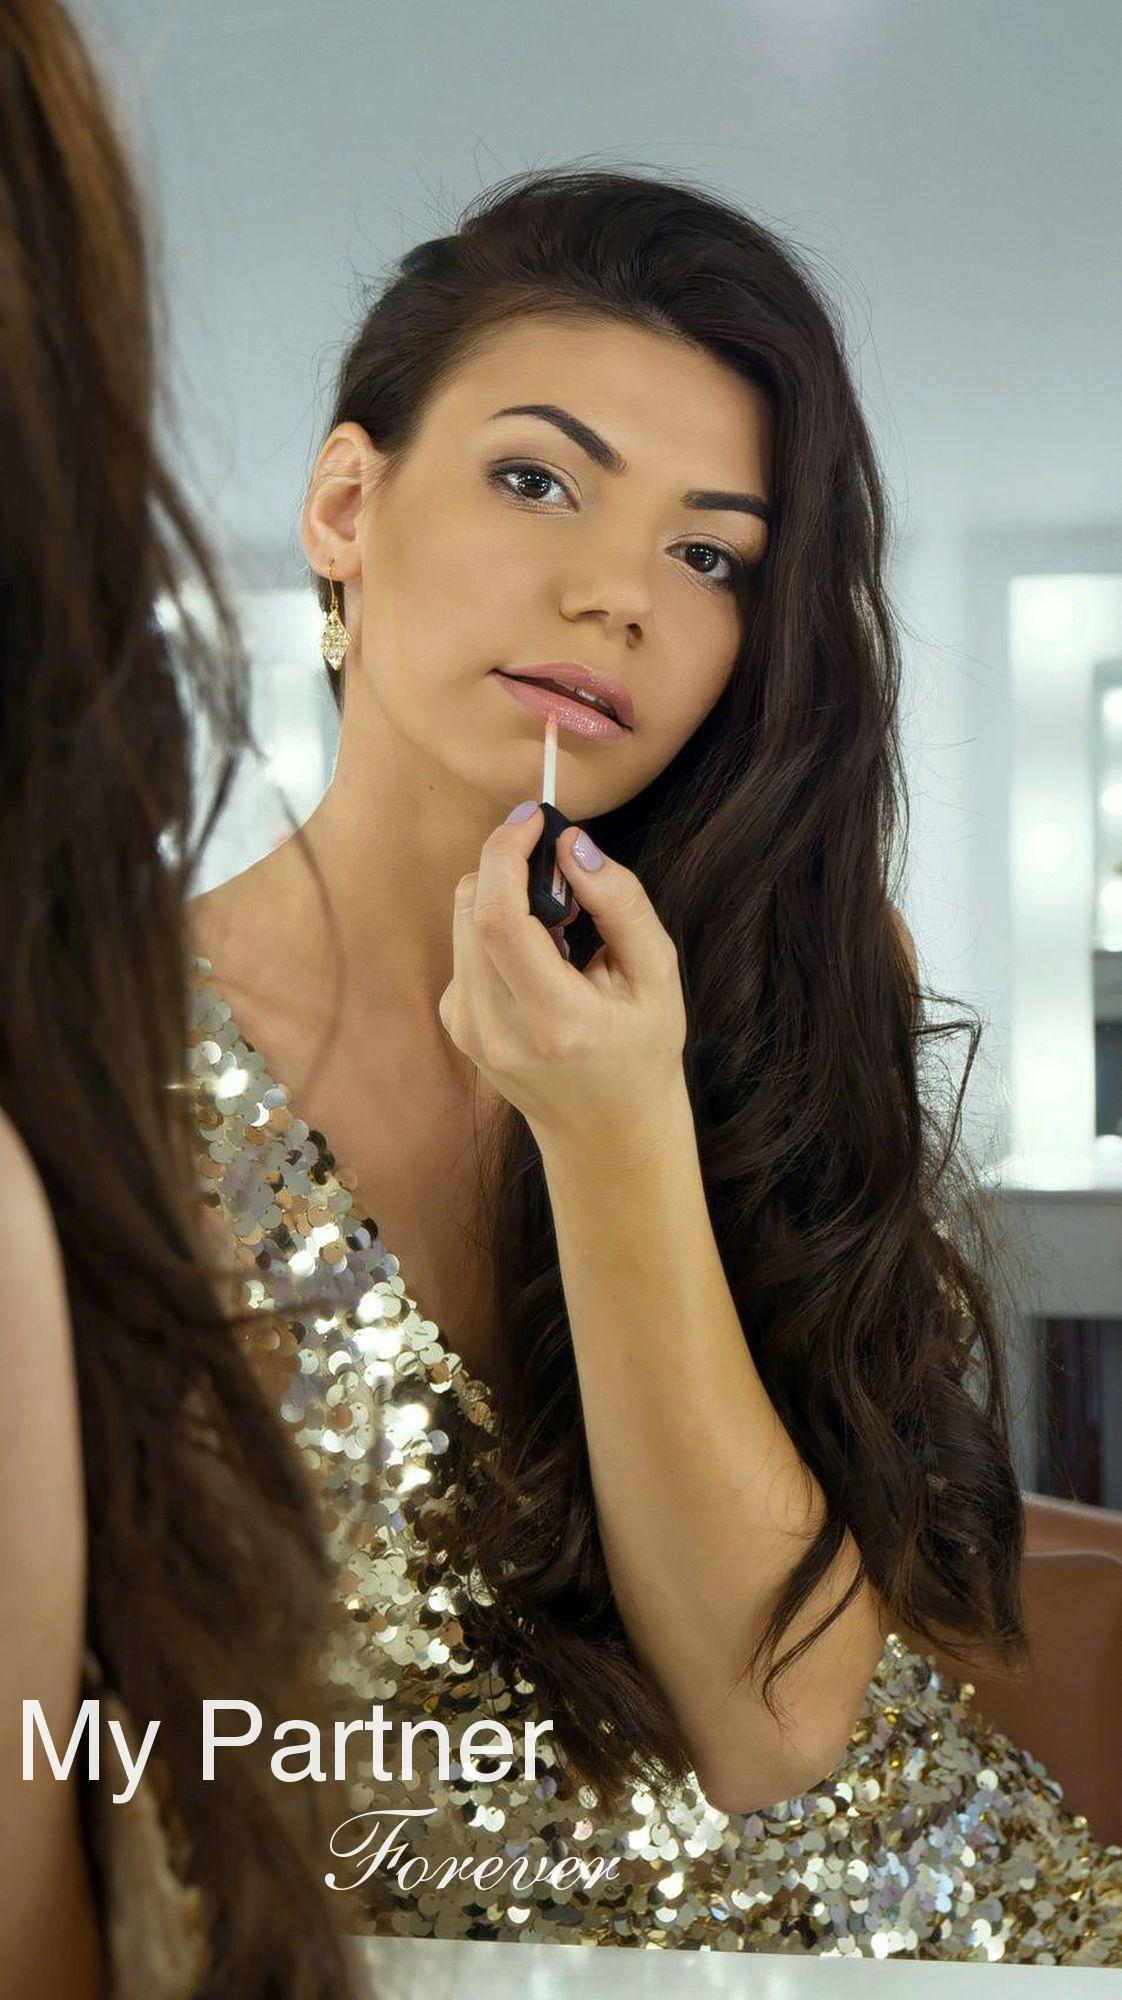 Dating with Pretty Ukrainian Girl Irina from Dniepropetrovsk, Ukraine